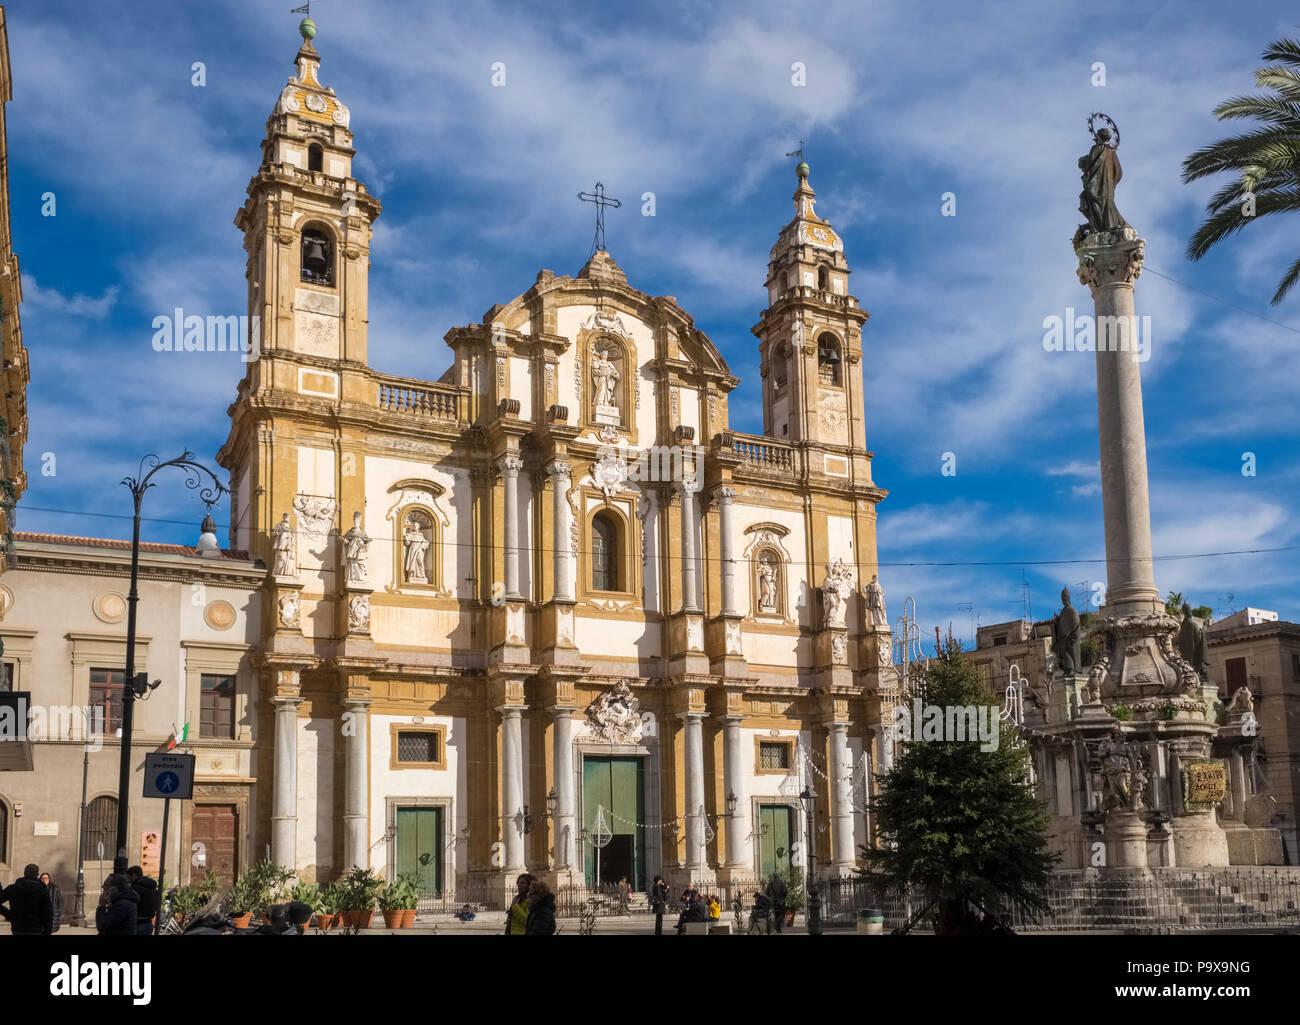 La iglesia de San Domenico de Sicilia, Palermo, Sicilia, Italia, Europa Imagen De Stock